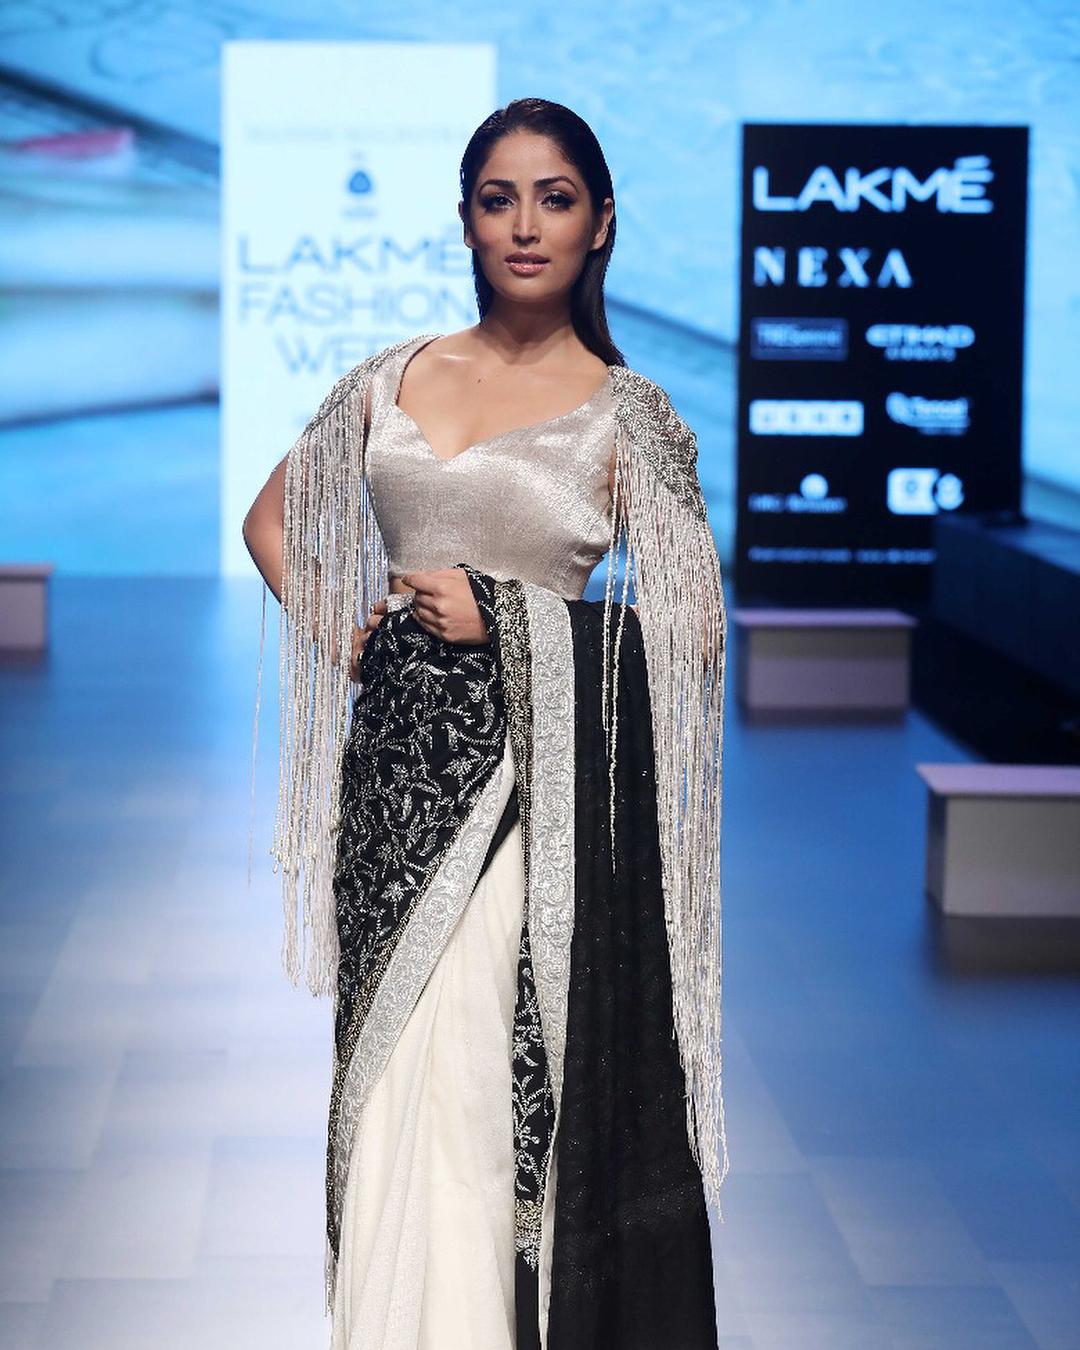 Lakme Fashion Week Summer Resort 2018, Lakme Fashion Week, Bridal Saree, Bollywood Fashion, Yami Gautam, Manish Malhotra